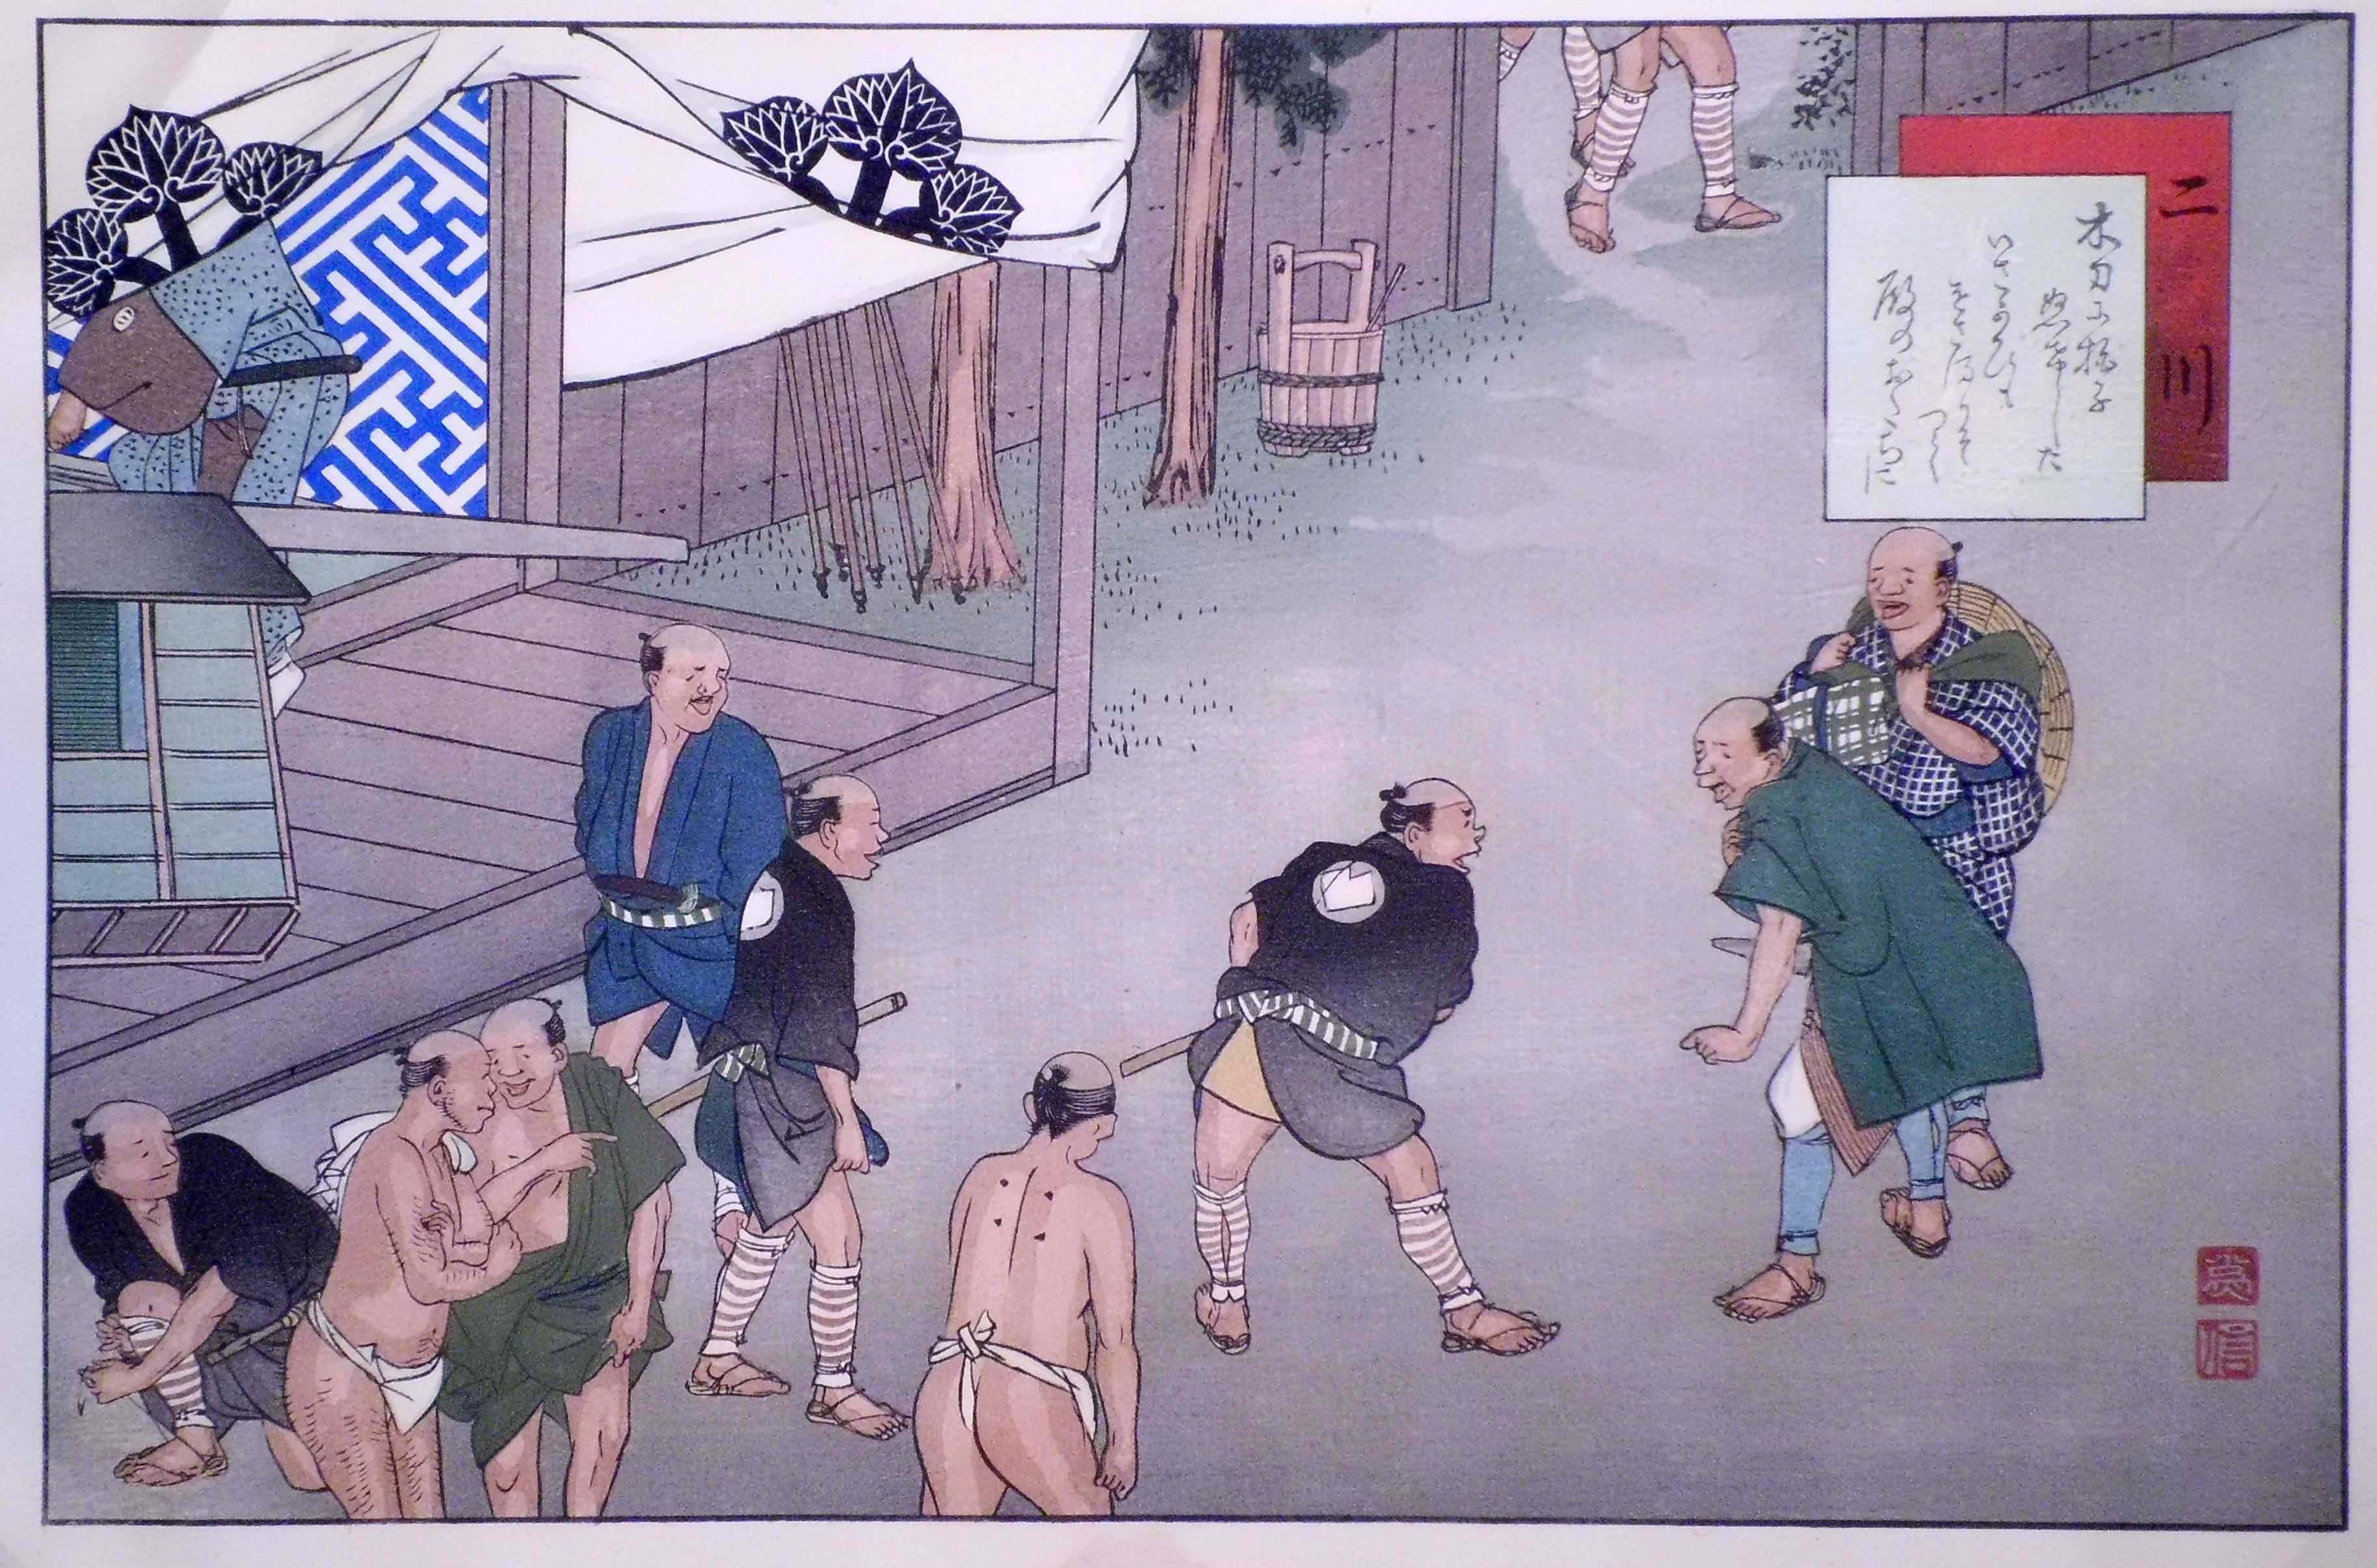 Fujikawa TAMENOBU (attivo nel 1890/1914) – FUTAGAWA, TRENTATREESIMA STAZIONEDELLA TOKAIDO